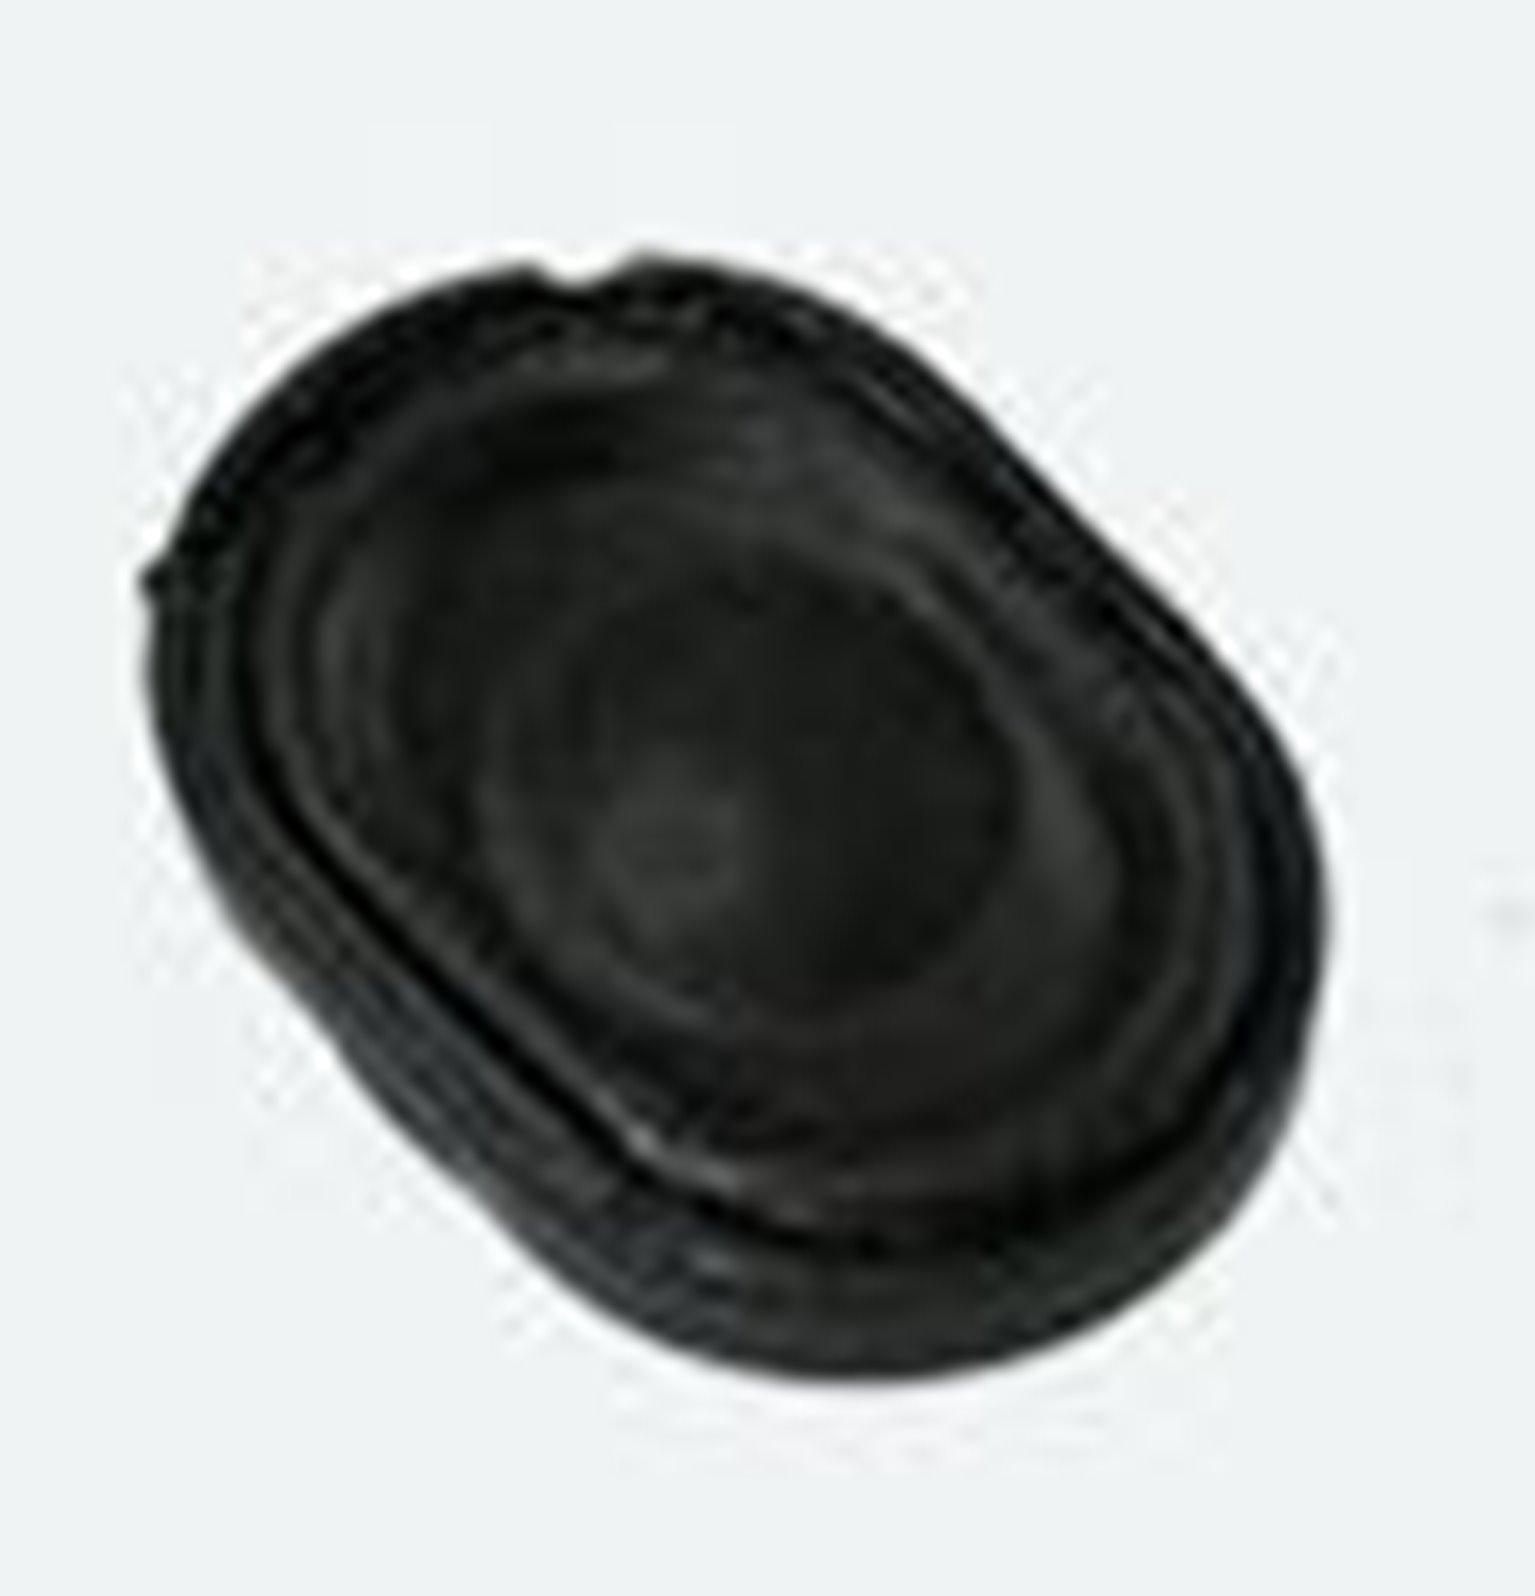 20 x 13.5mm 8 Ohm inc chamber